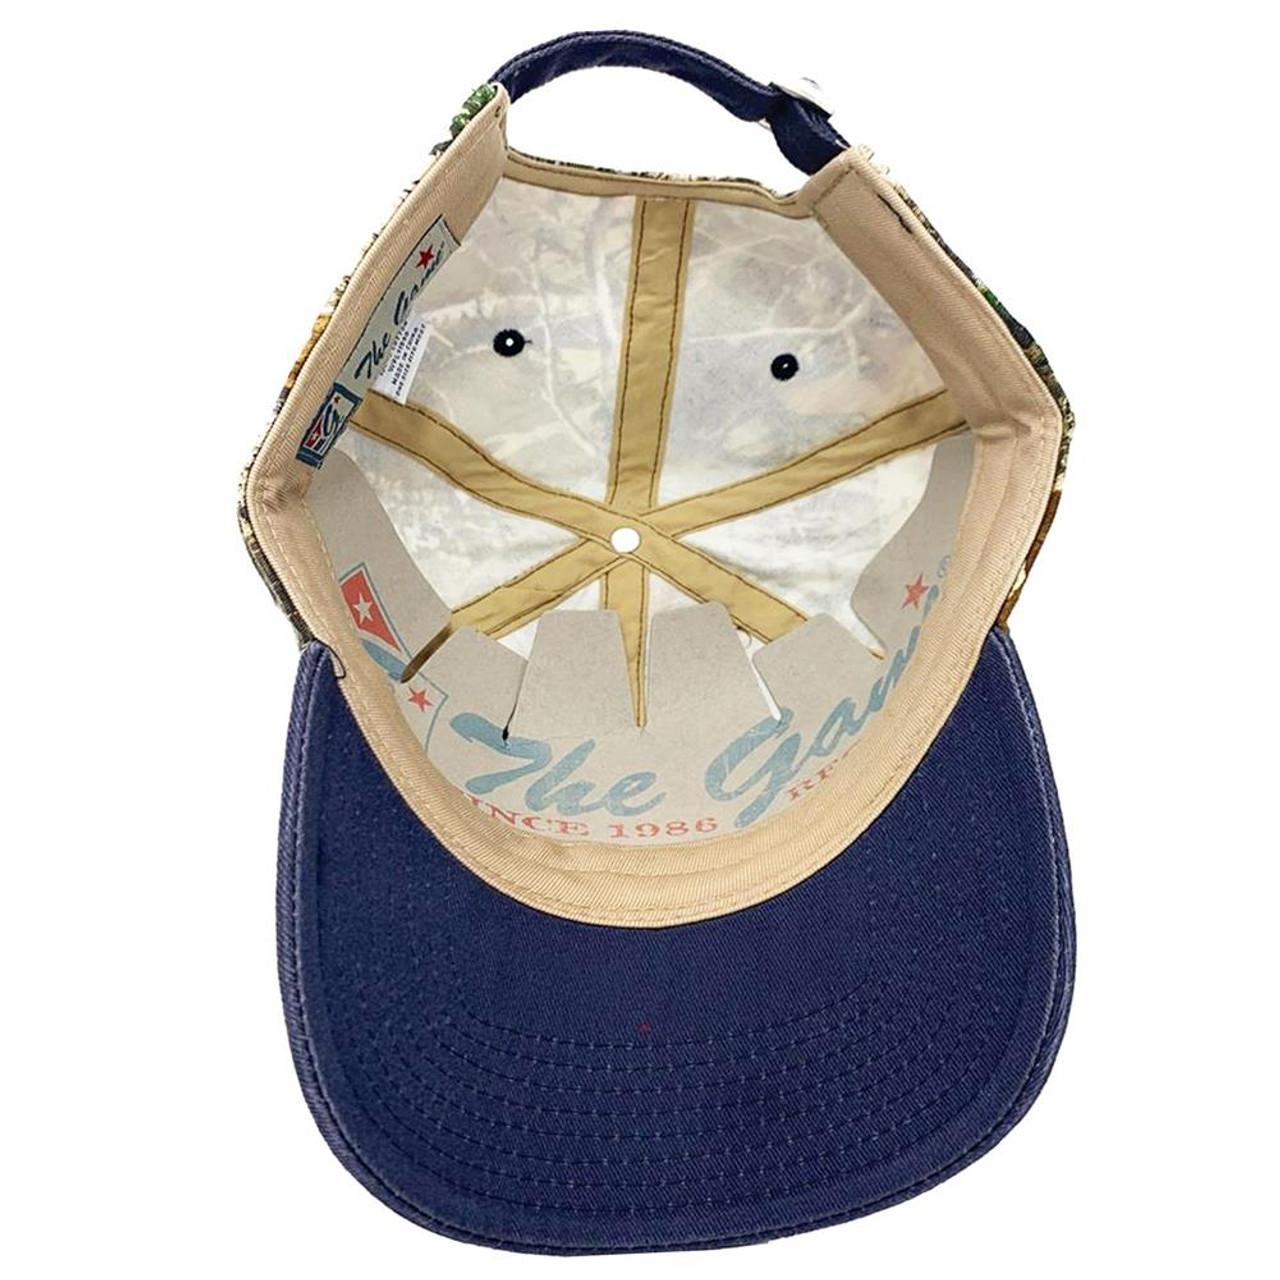 University of Tulsa Camo Hat Realtree Edge Camo Two-Tone Cap